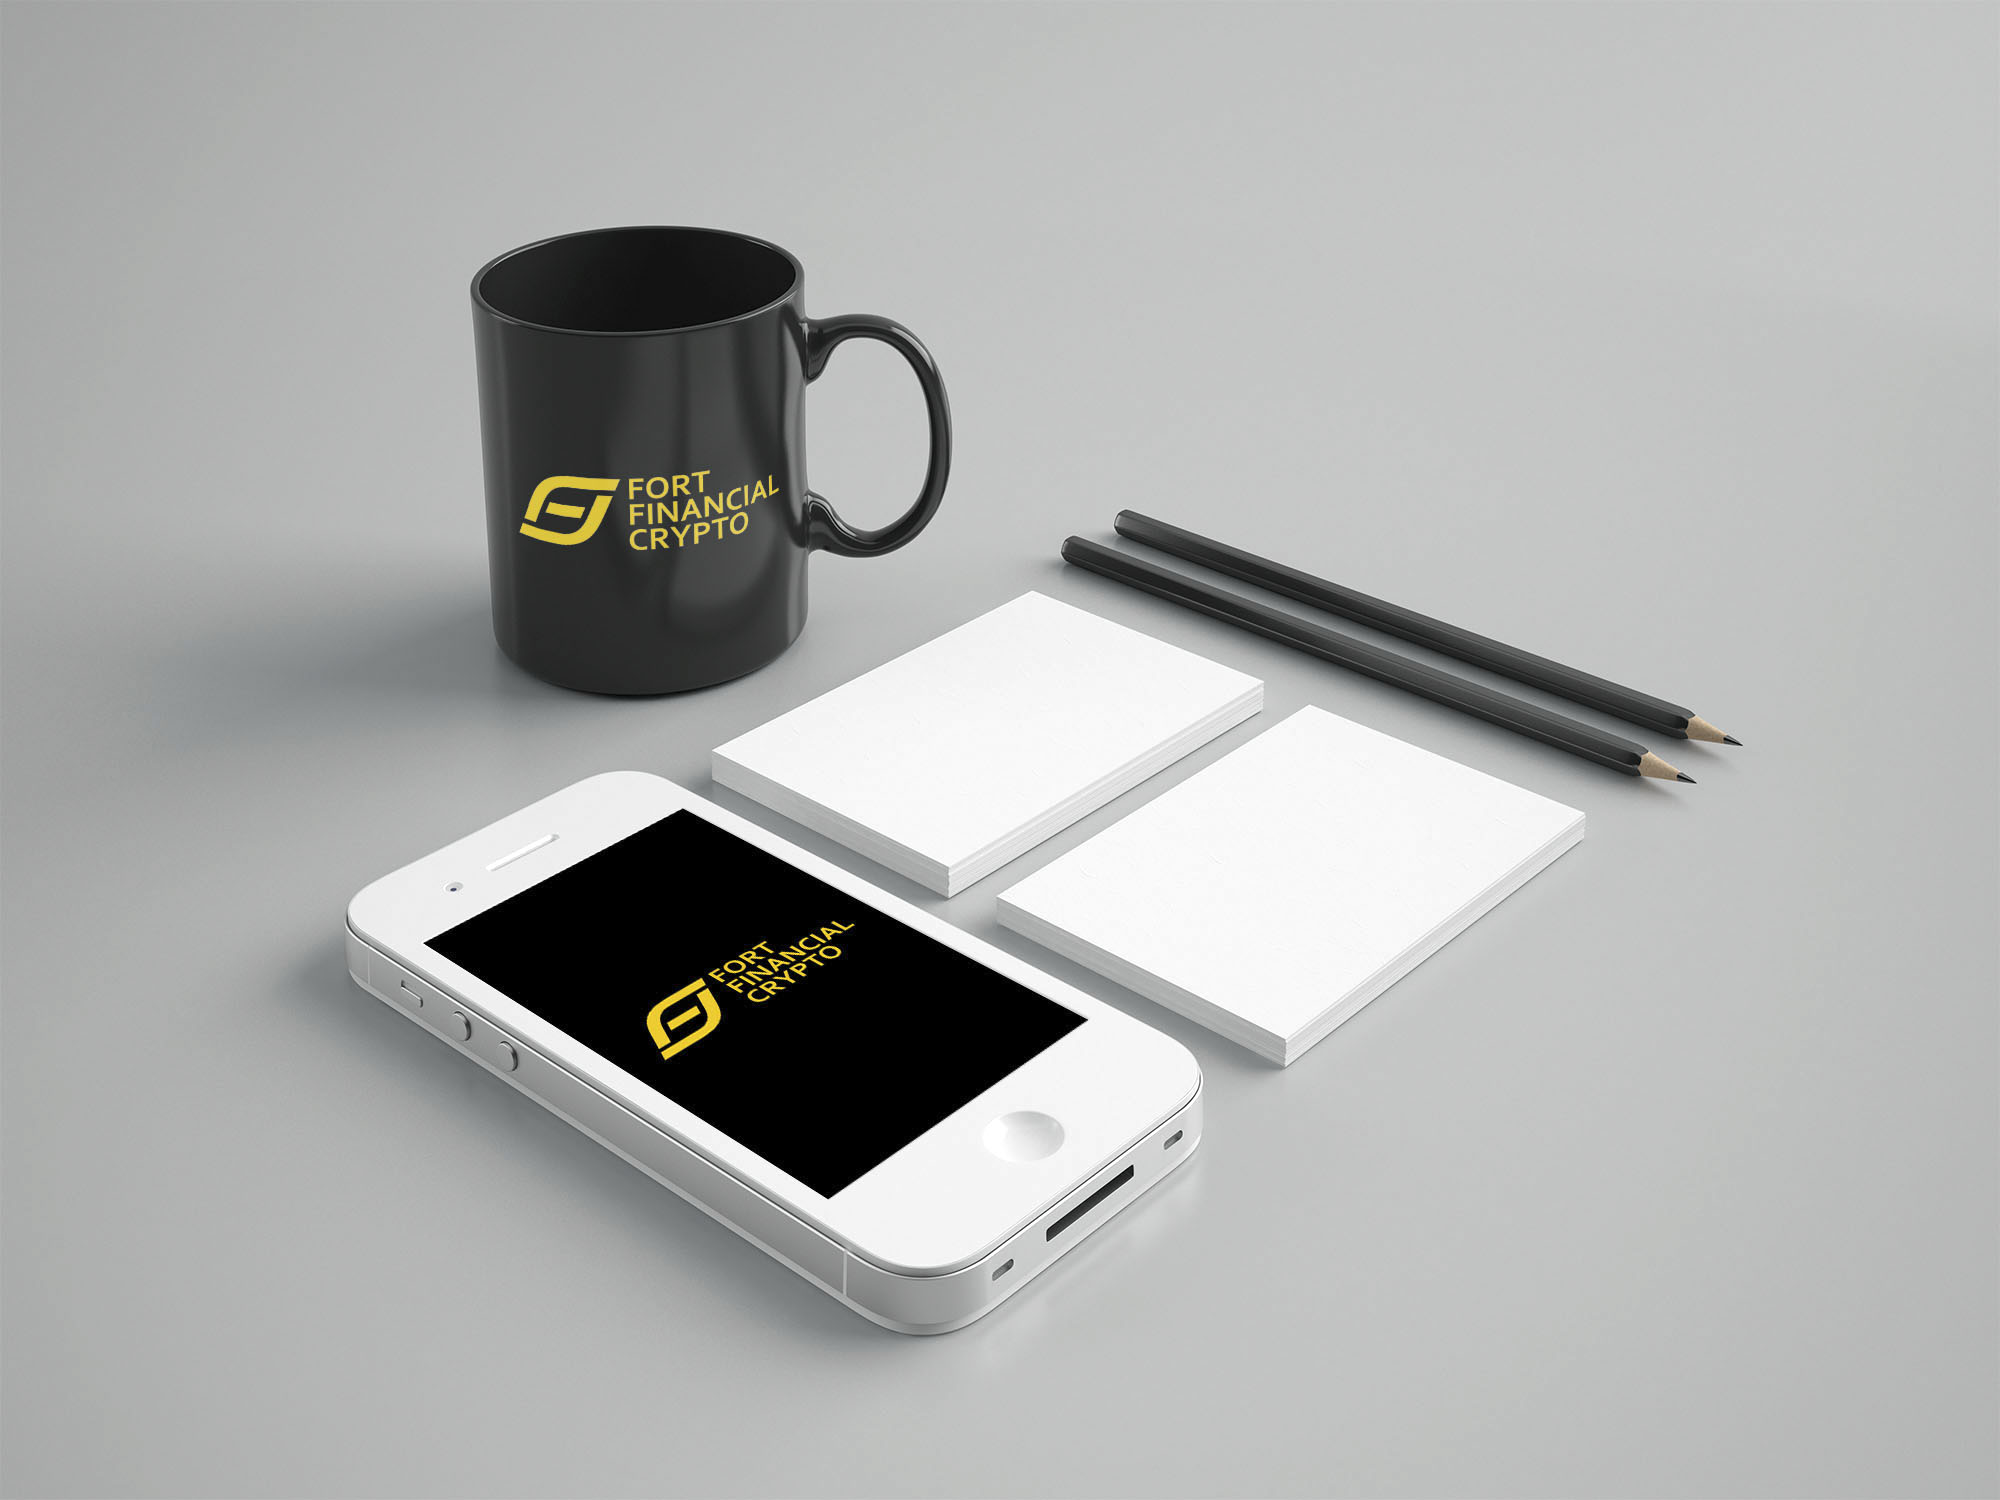 Разработка логотипа финансовой компании фото f_3115a91cd3535ae4.jpg